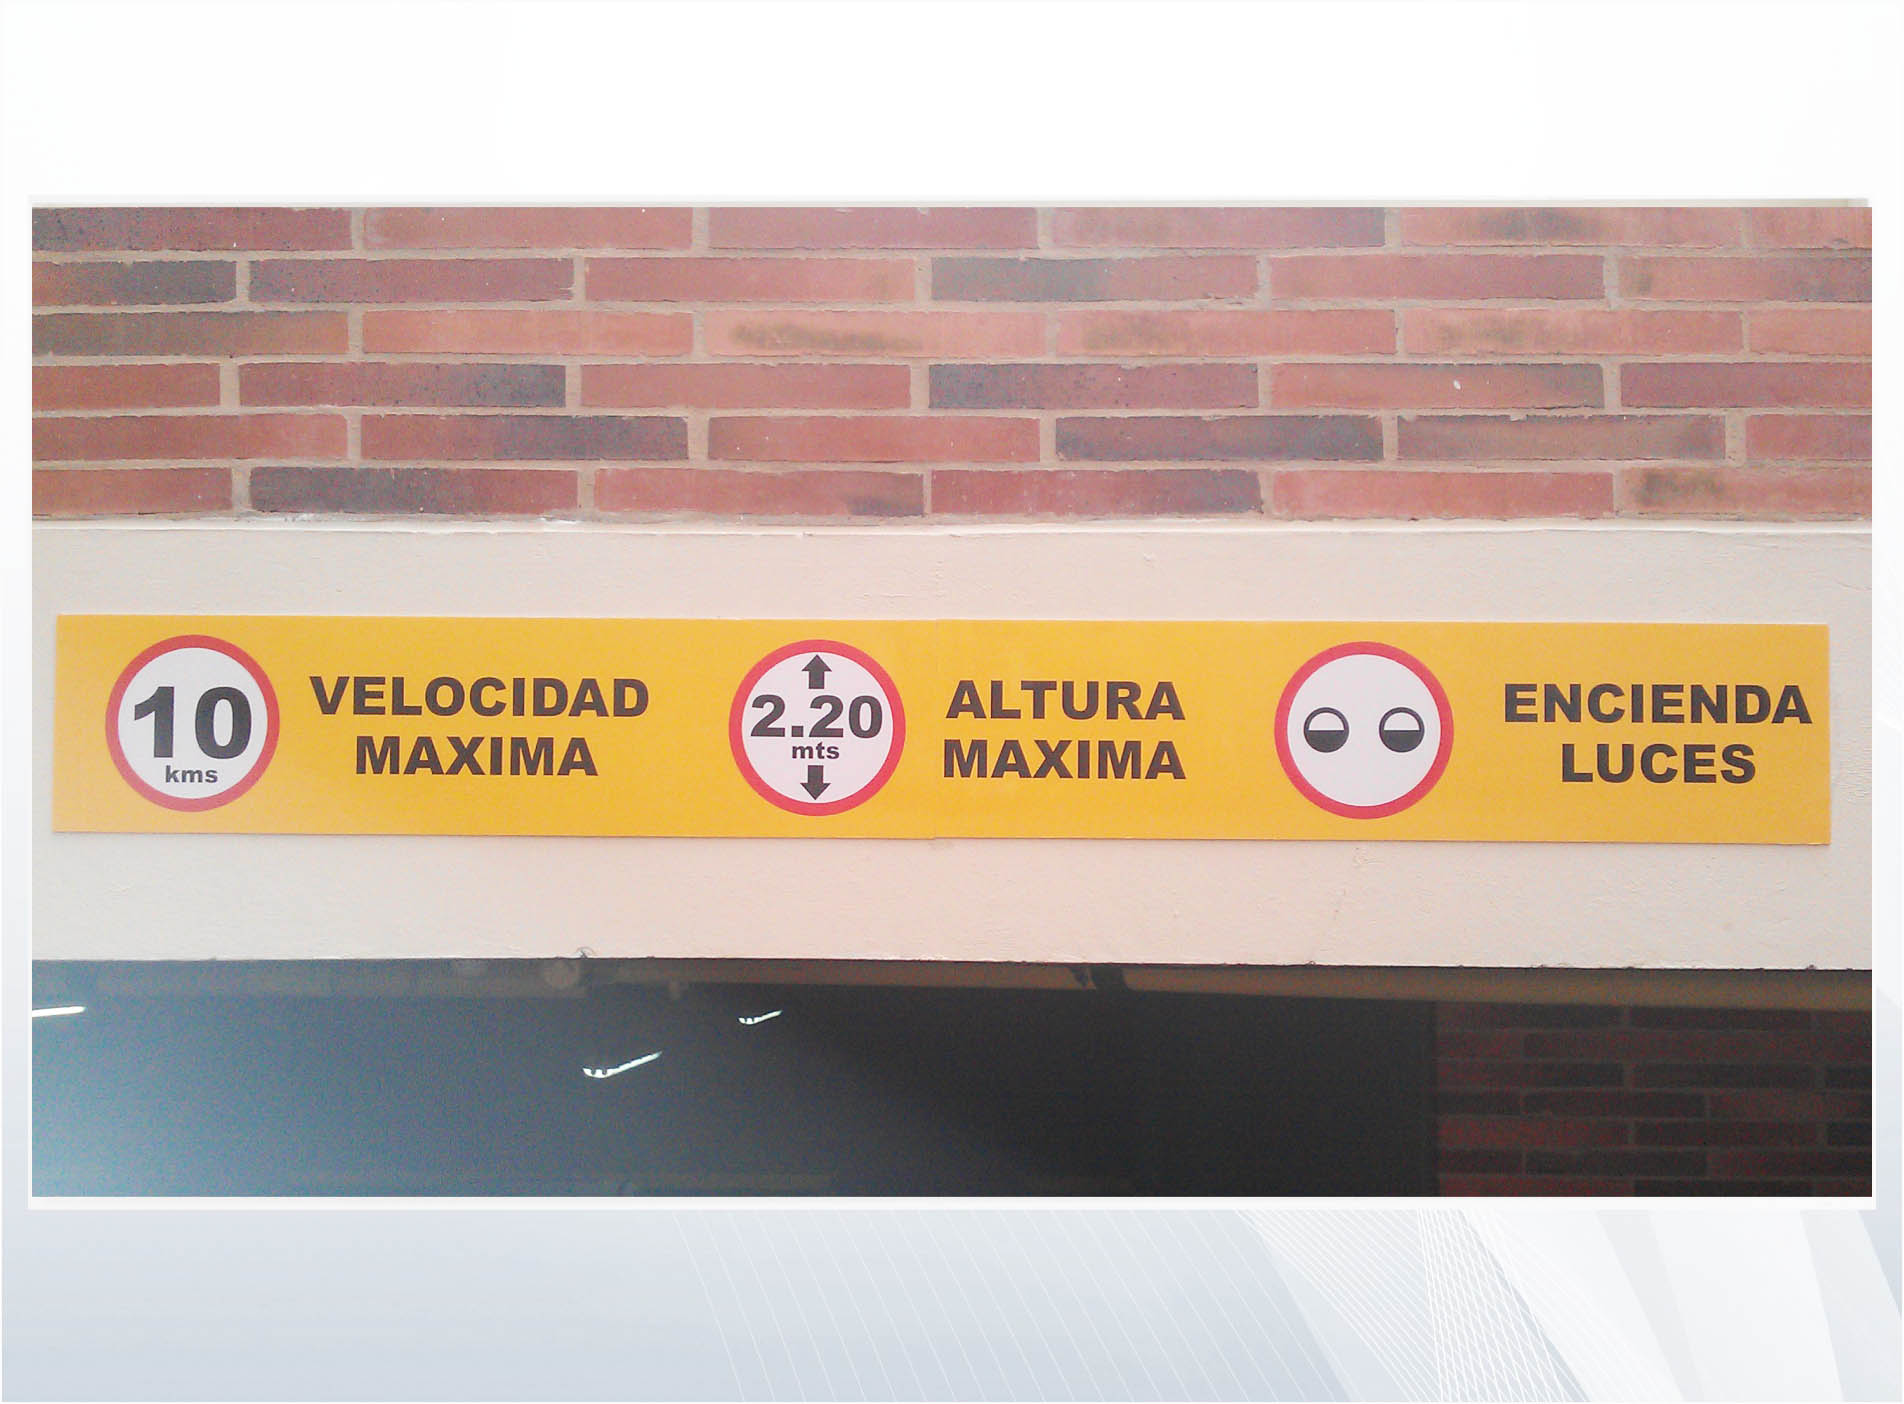 señal_parqueadero_poliestireno_vinilo_reflectivo_ggcm